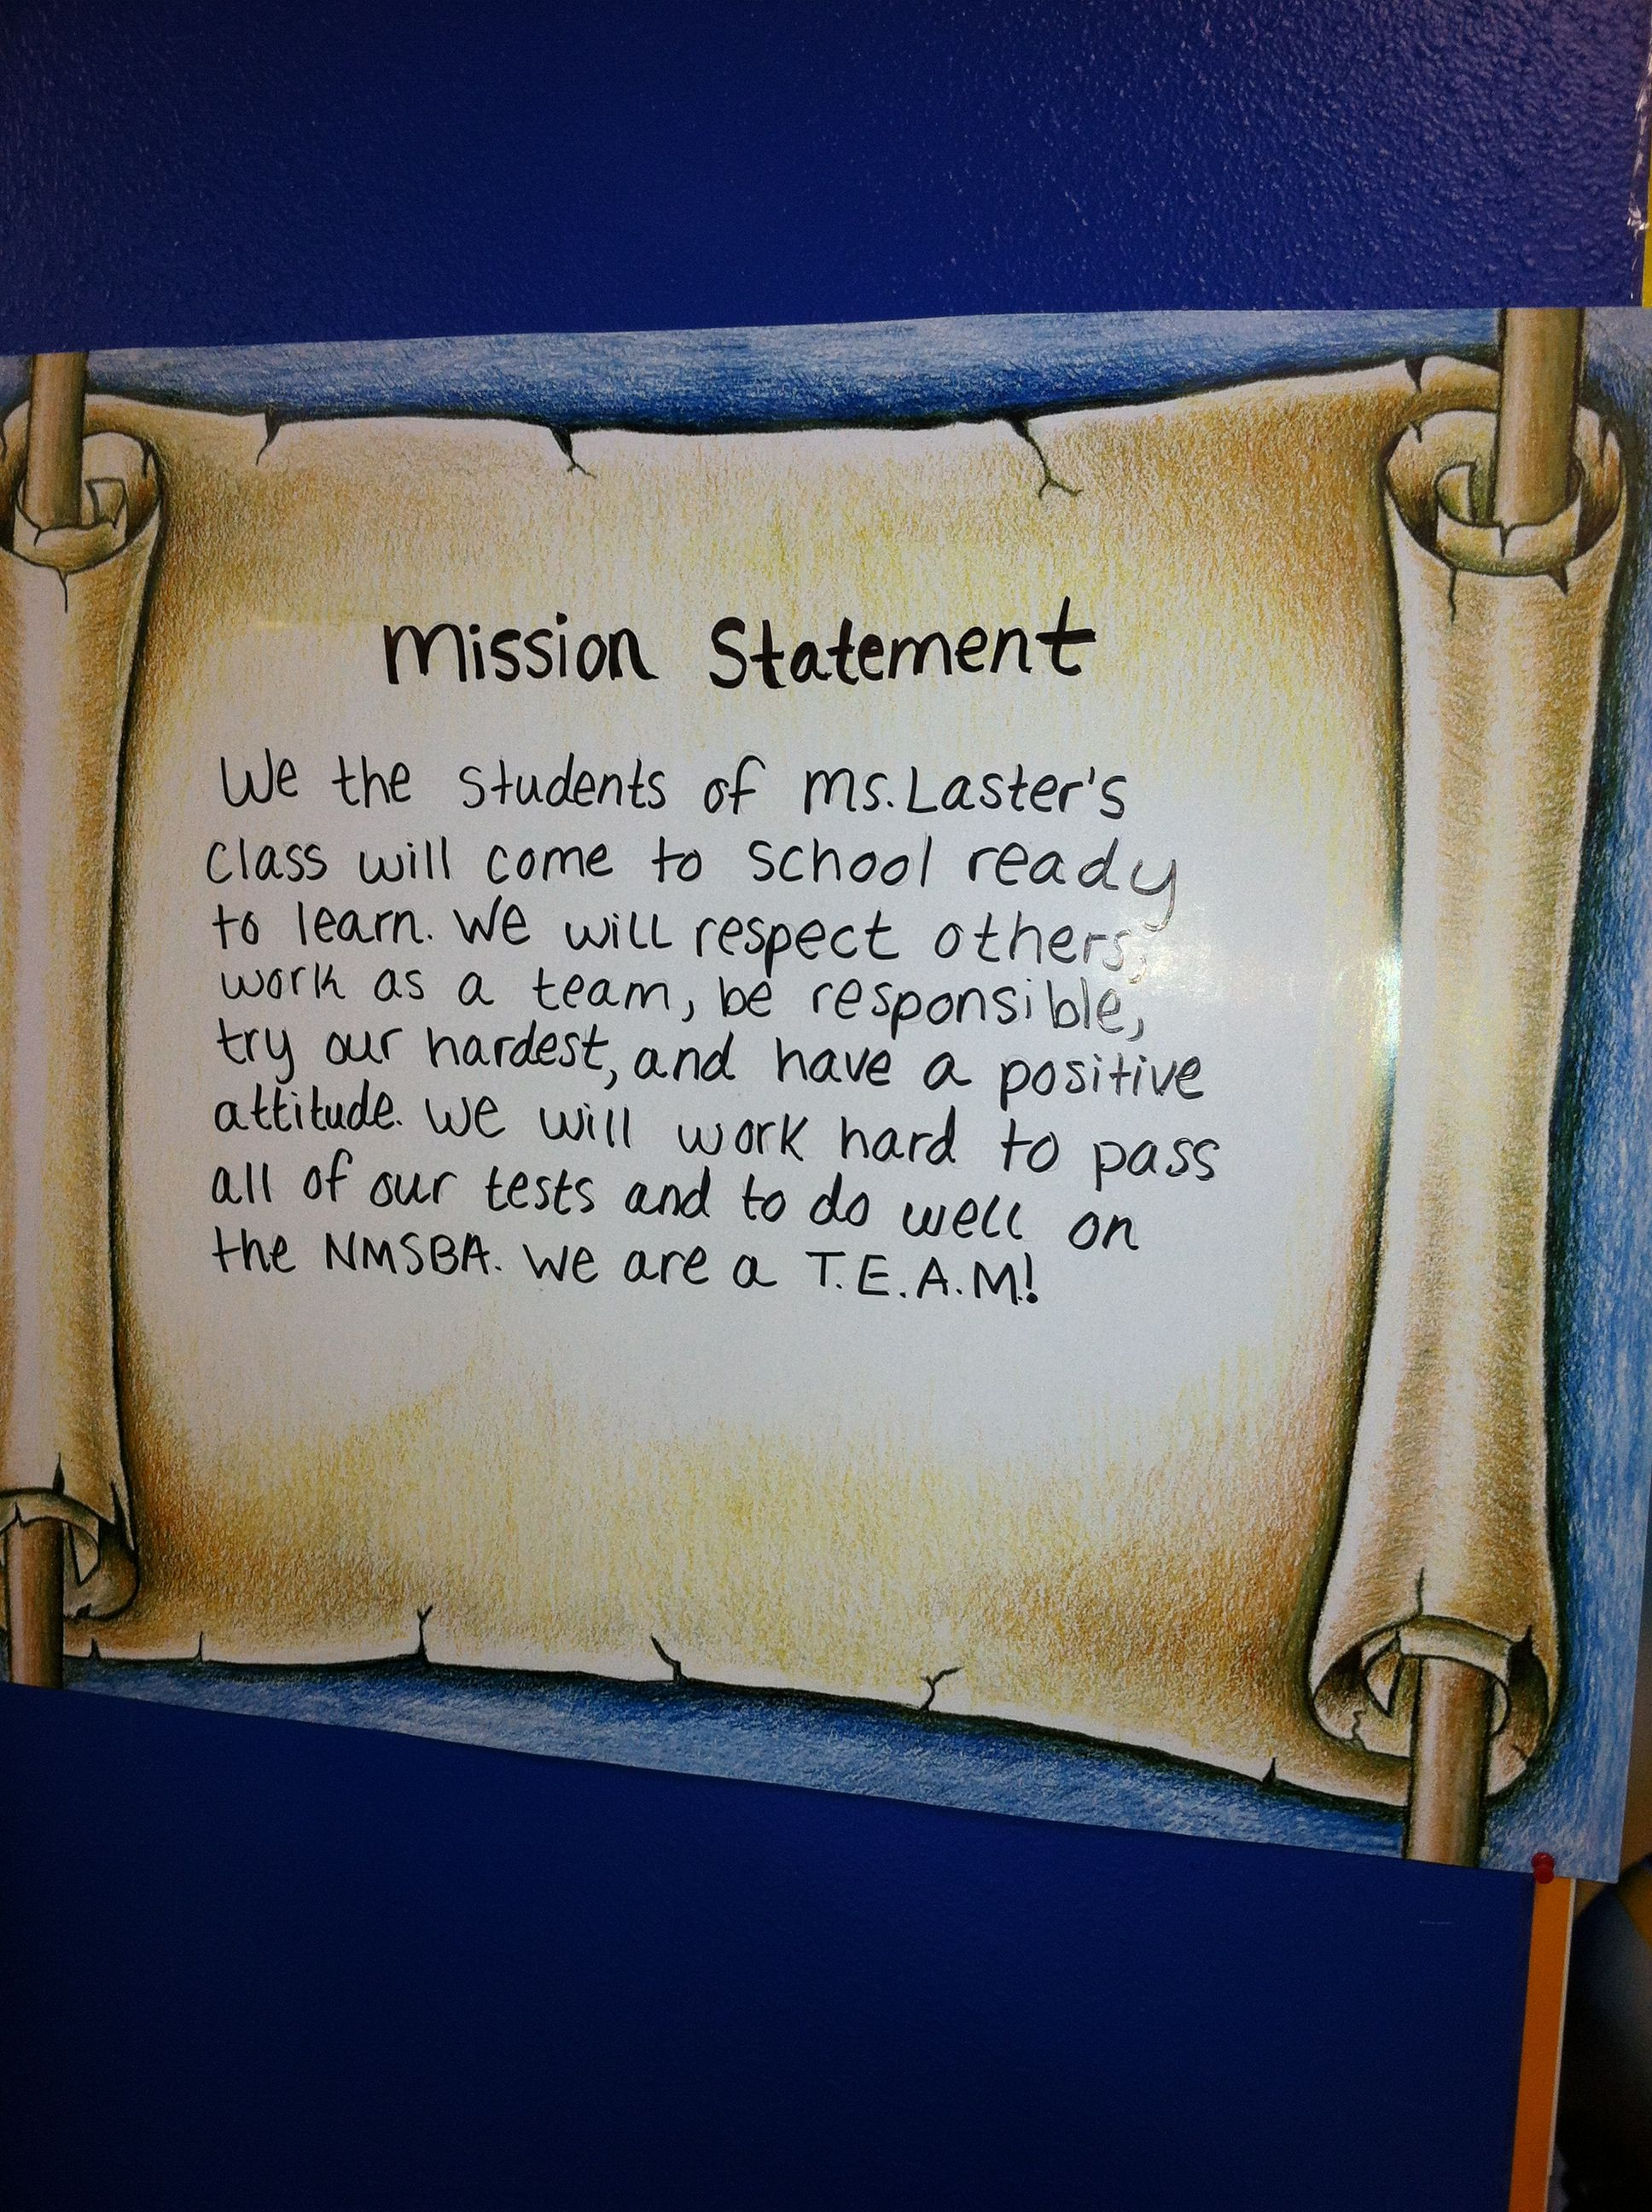 Class Mission Statement 5th Grade Mission Statement Examples Class Mission Statement Personal Mission Statement Examples